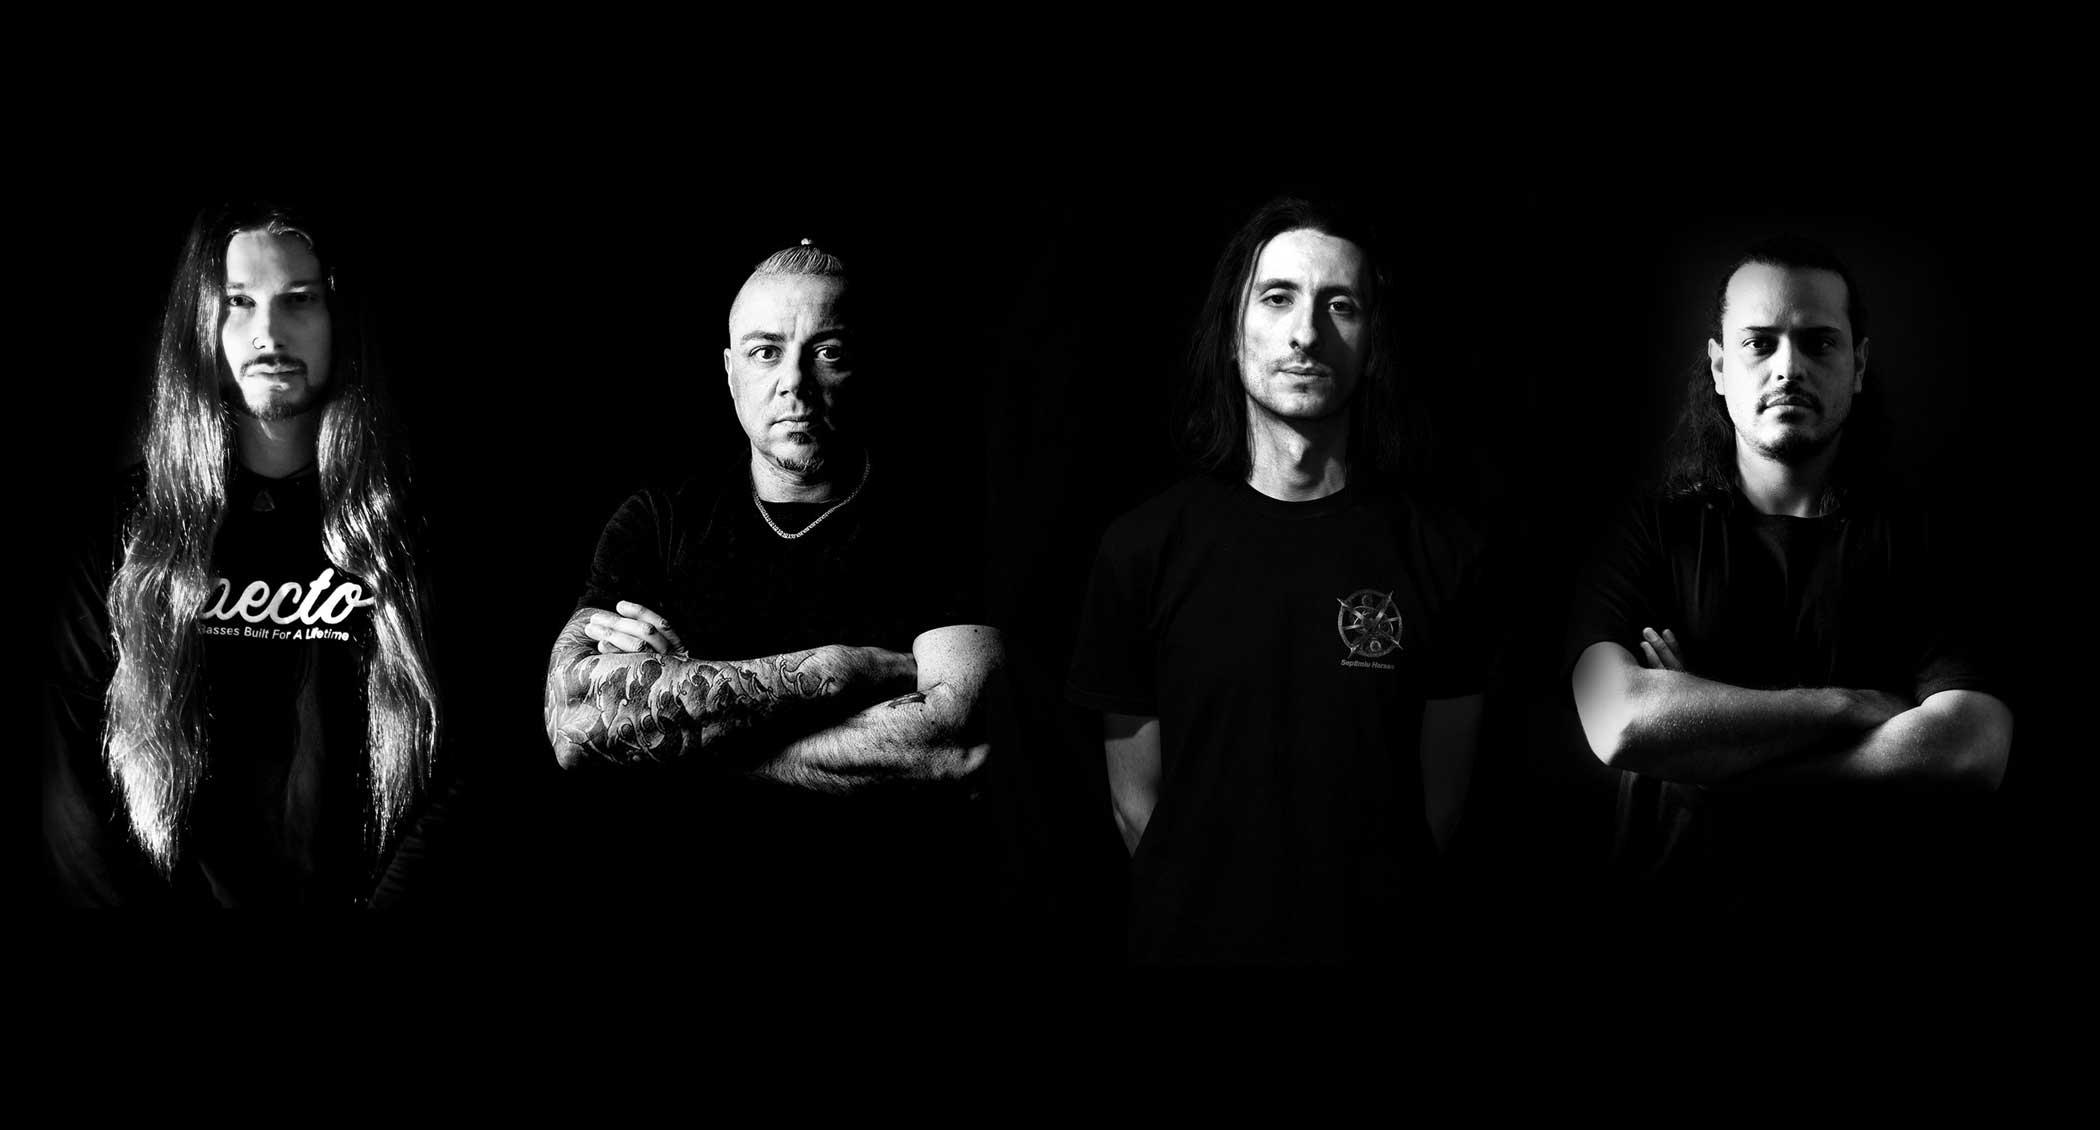 pestilence band group